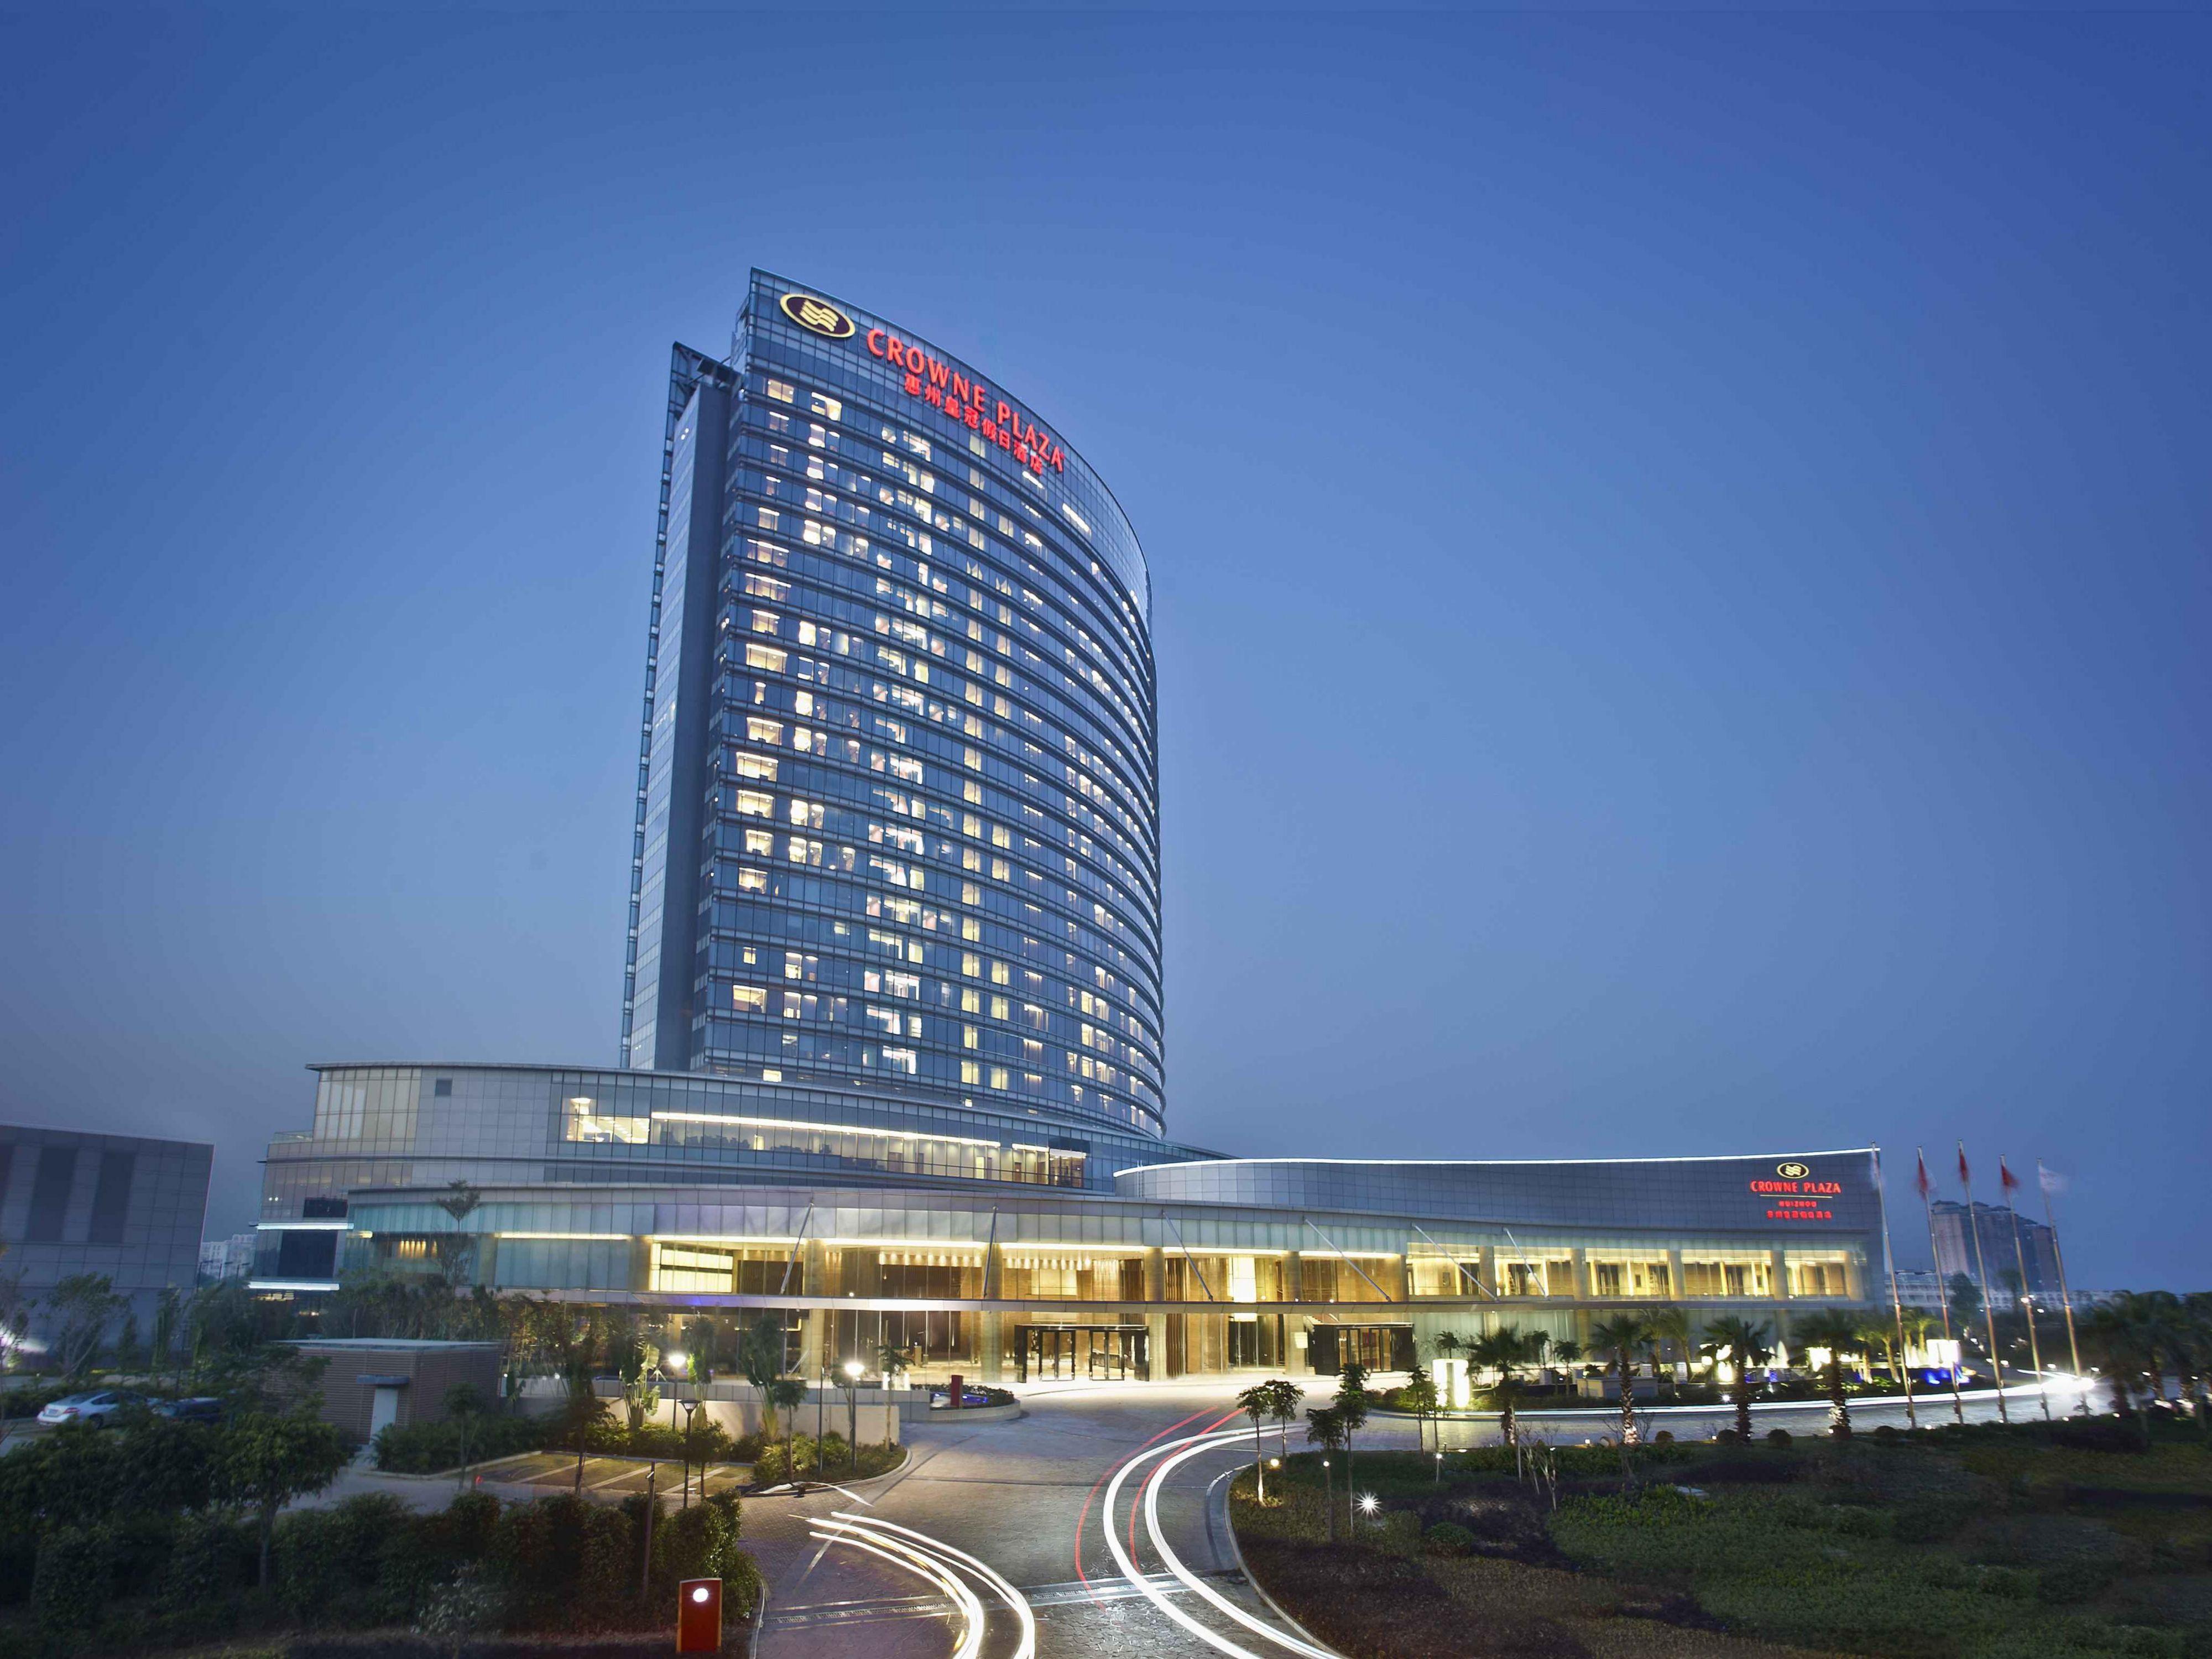 hotels in guangzhou best places to stay in guangzhou mainland rh ihg com